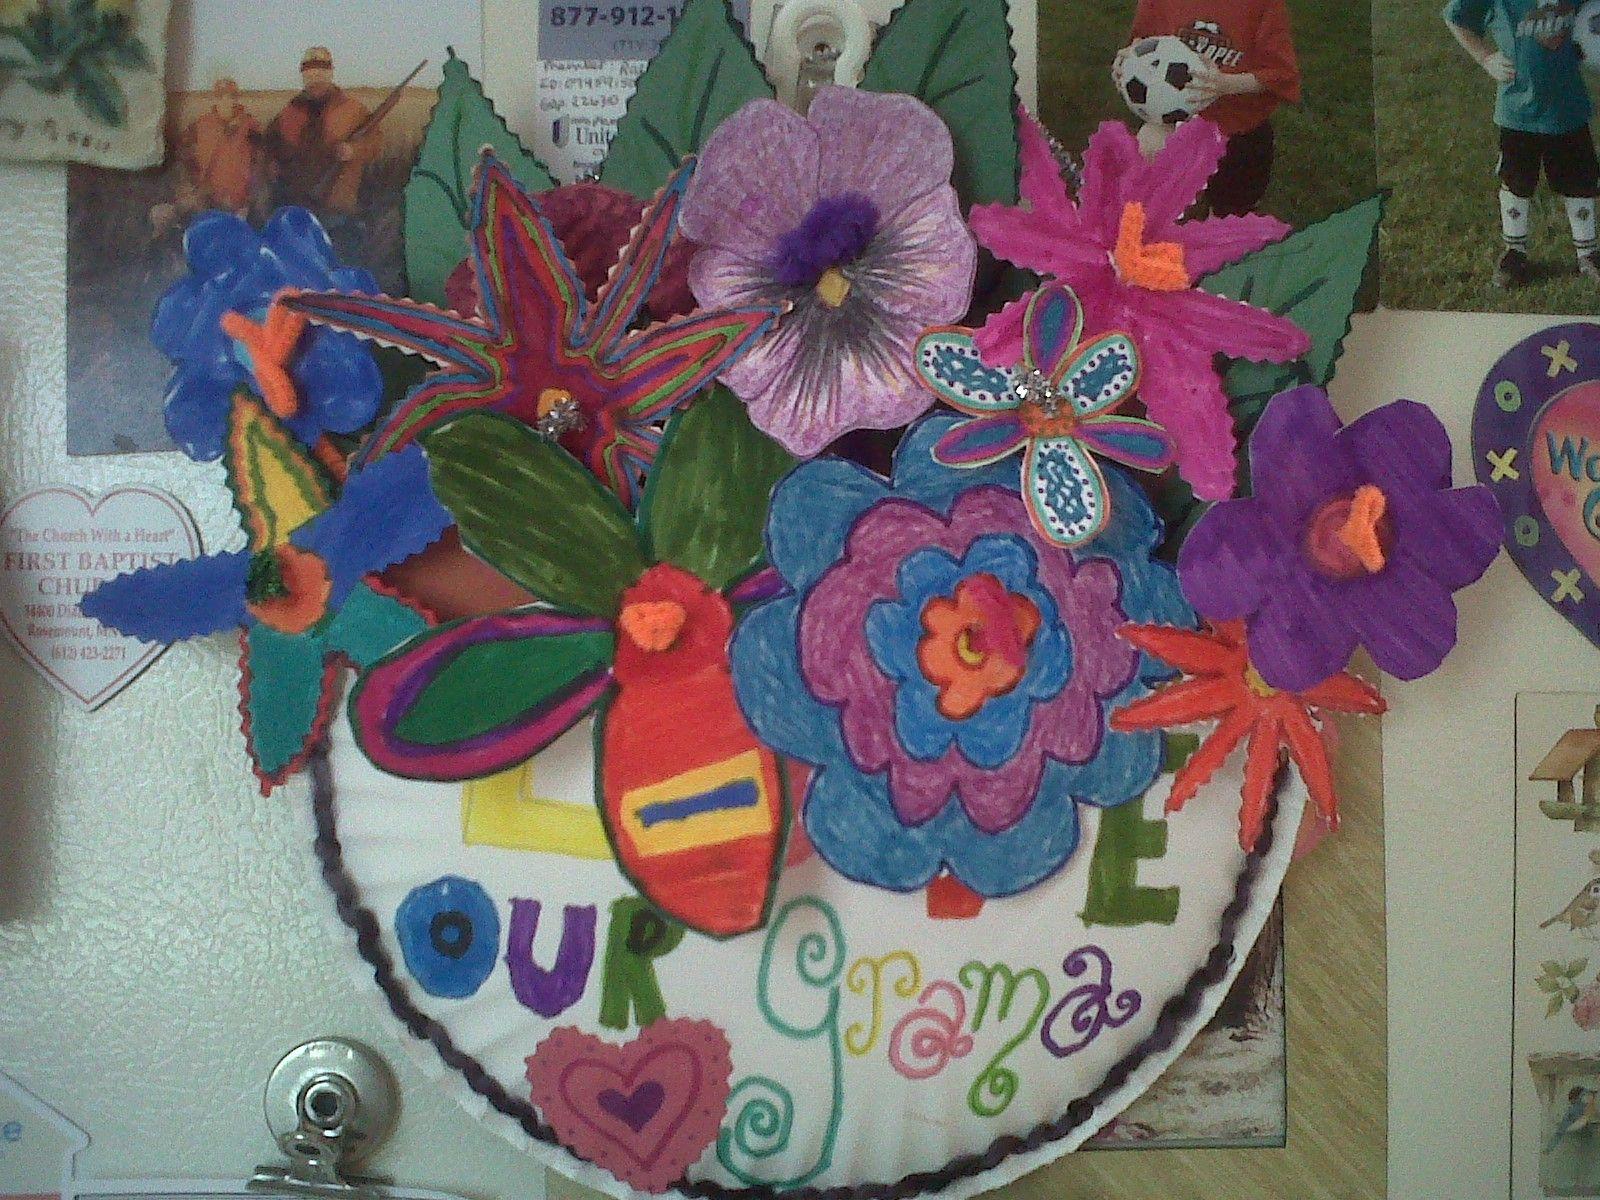 Paper plate flowers basket flower shapes drawn on paper plates paper plate flowers basket flower shapes drawn on paper plates then cut out mightylinksfo